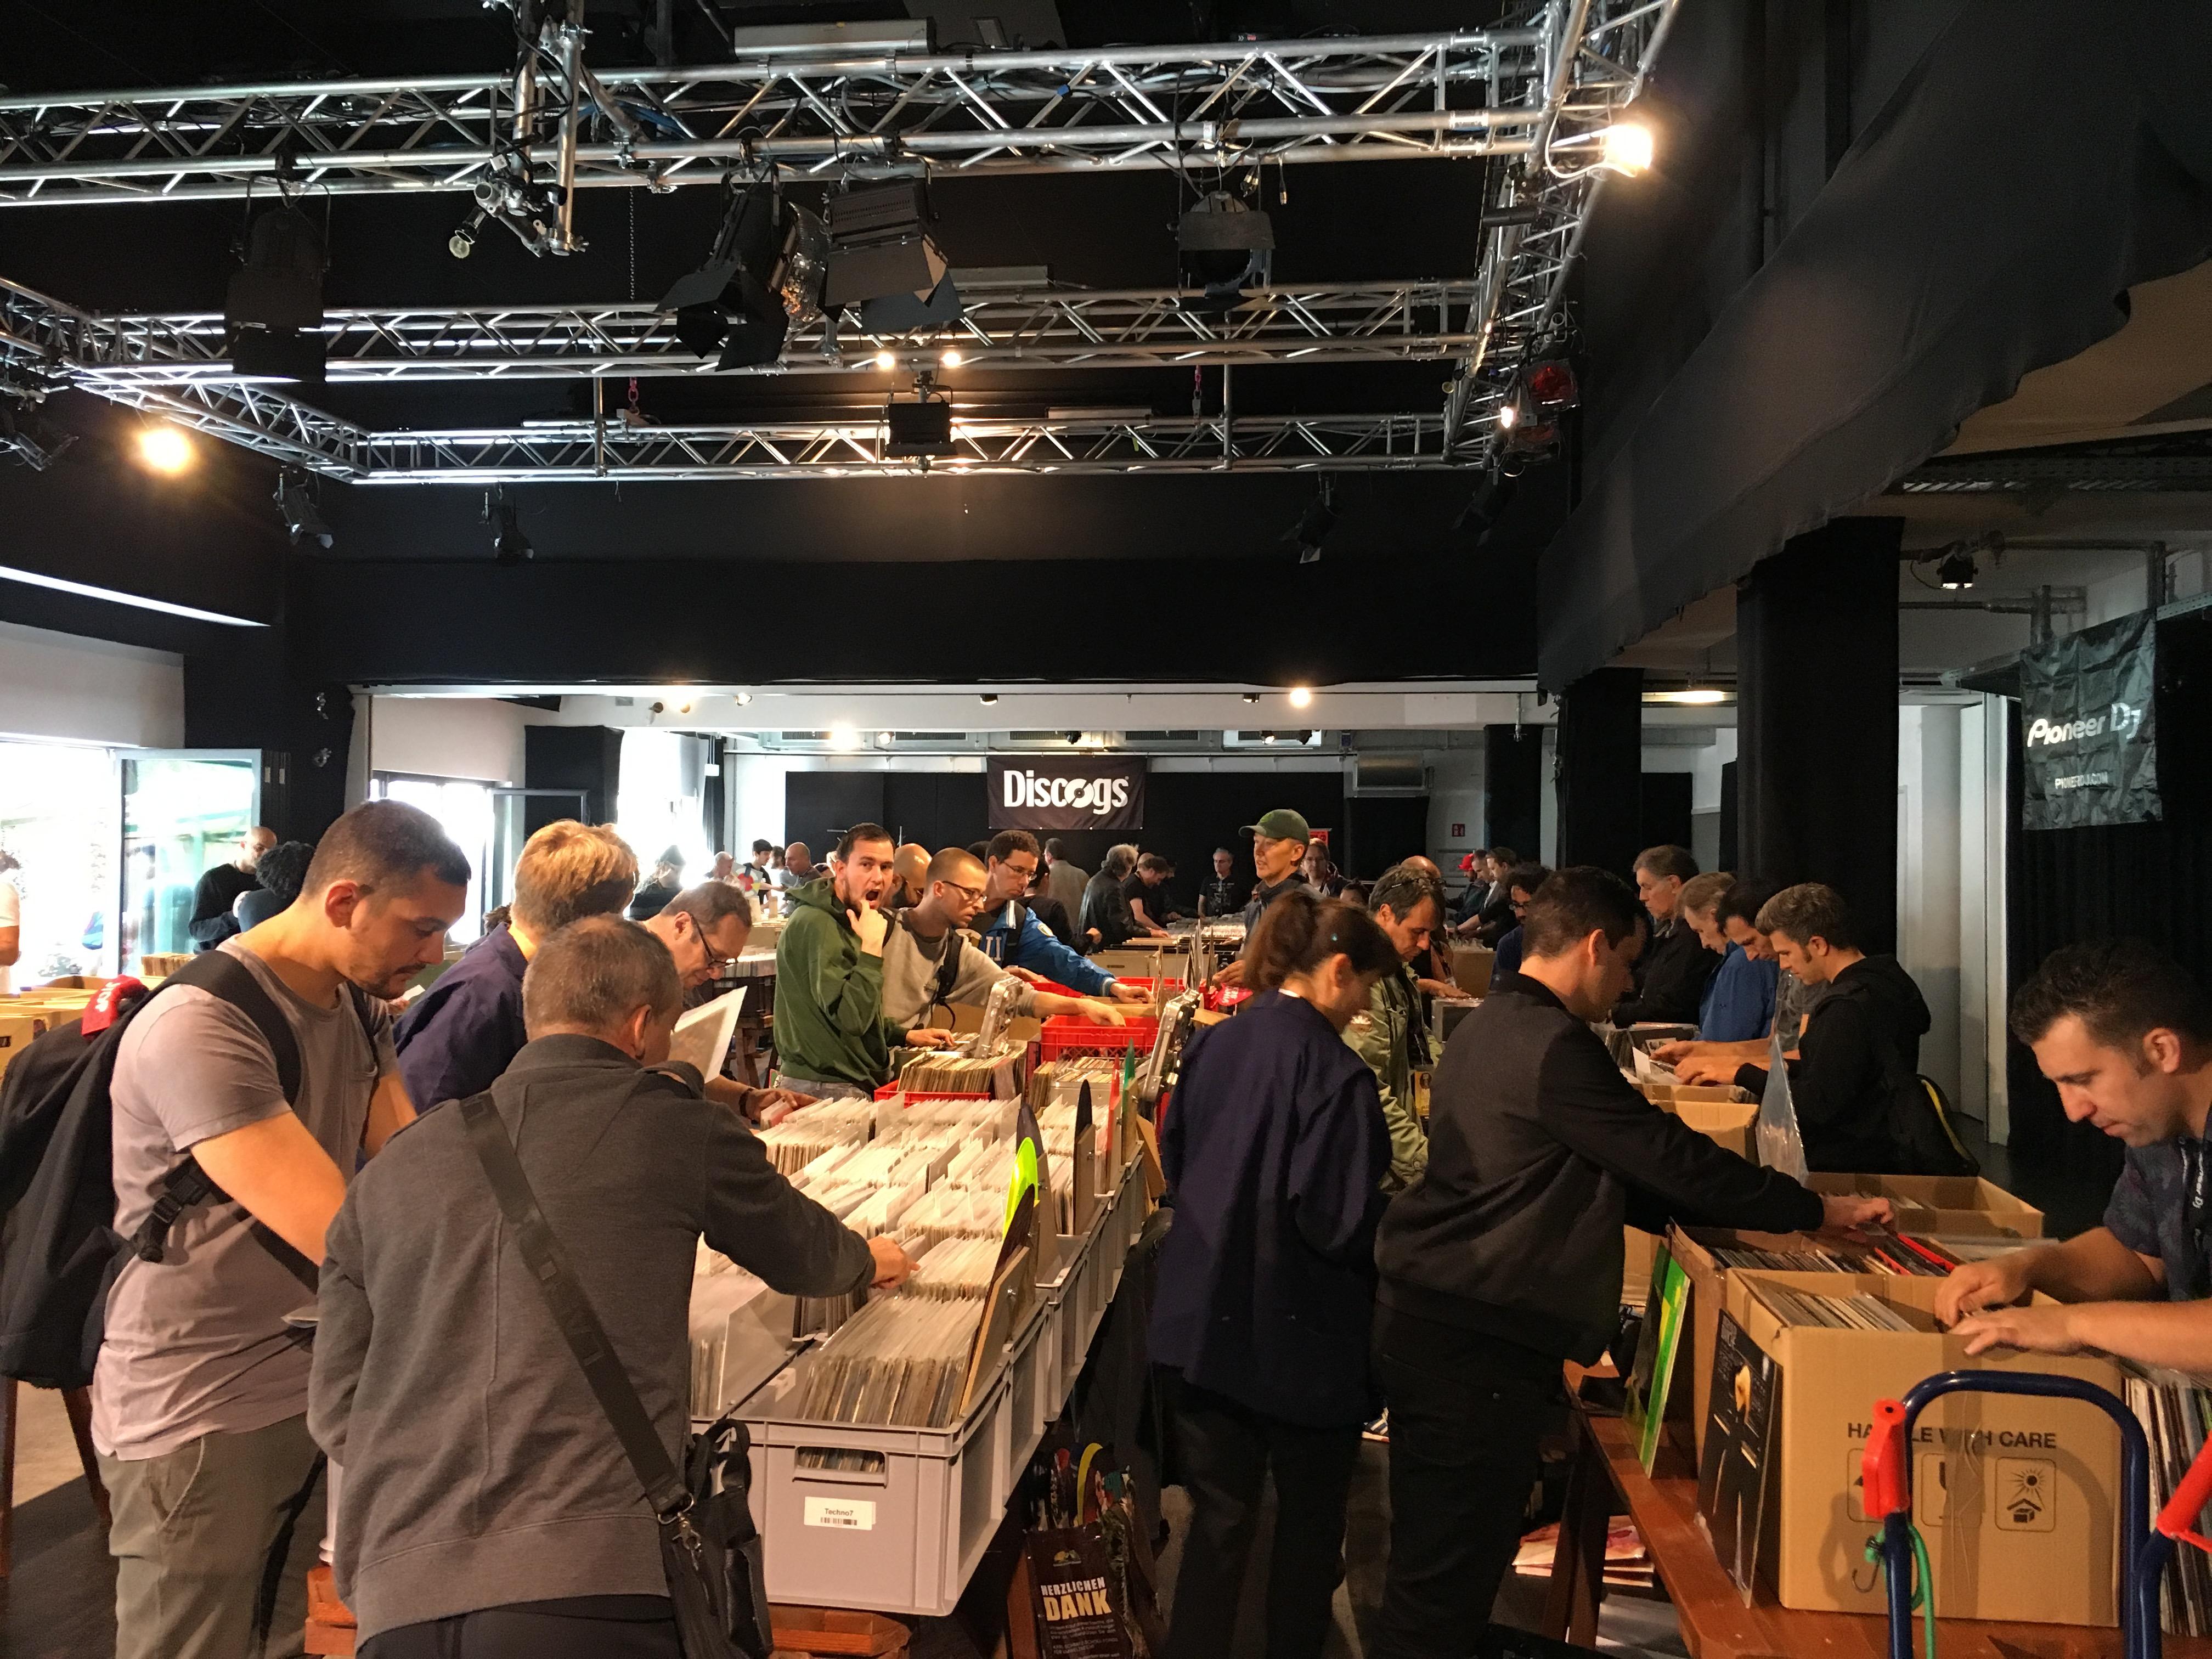 Crate Diggers Berlin